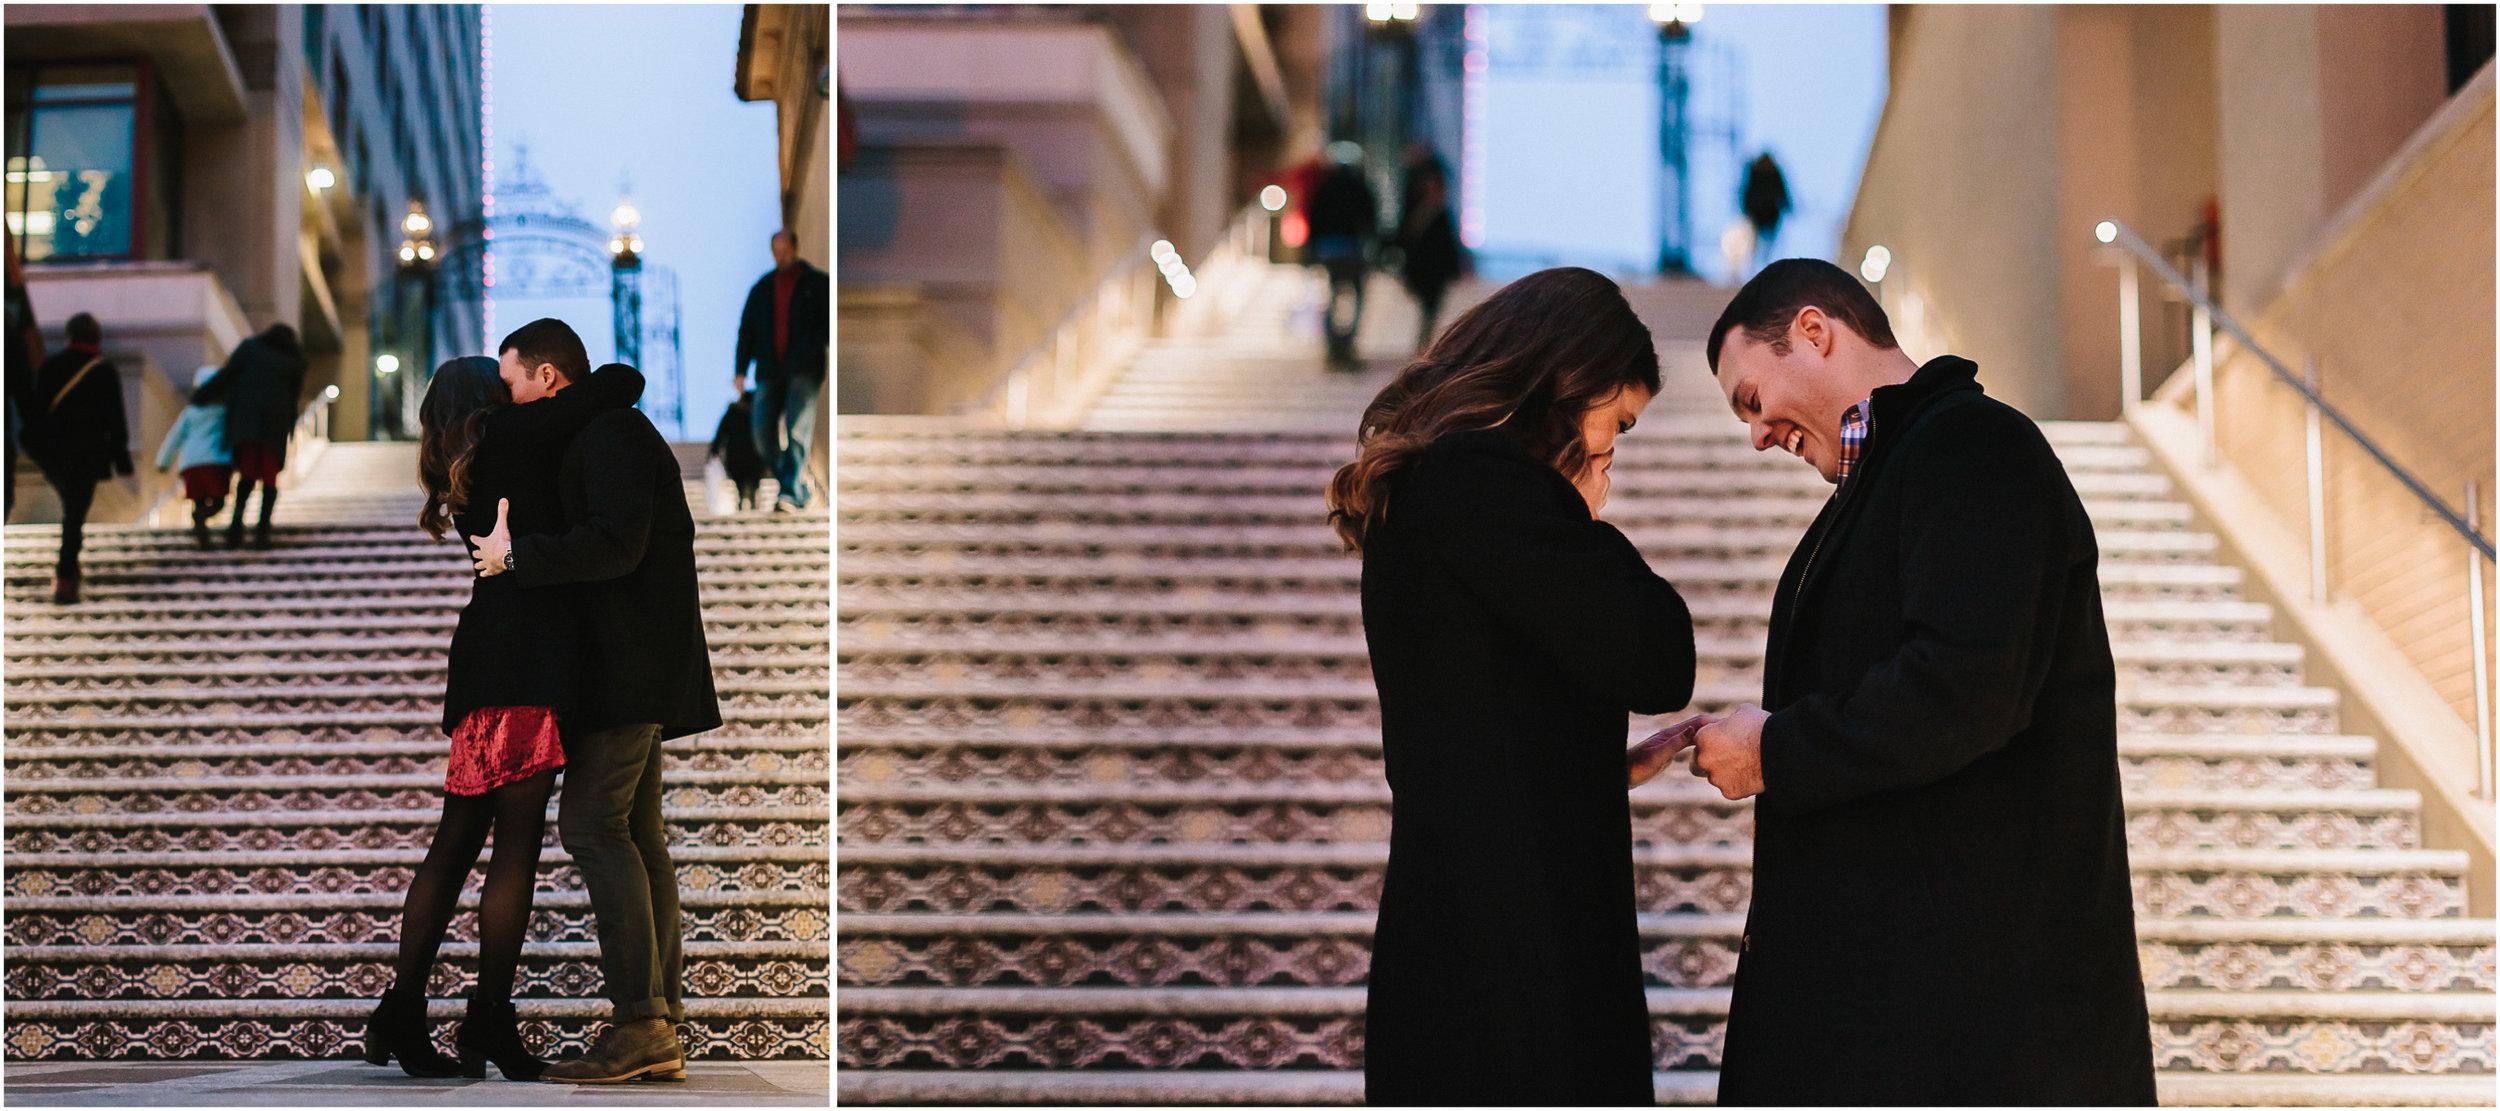 alyssa barletter photography christmas winter wedding proposal plaza lights plaza stairs she said yes-3.jpg